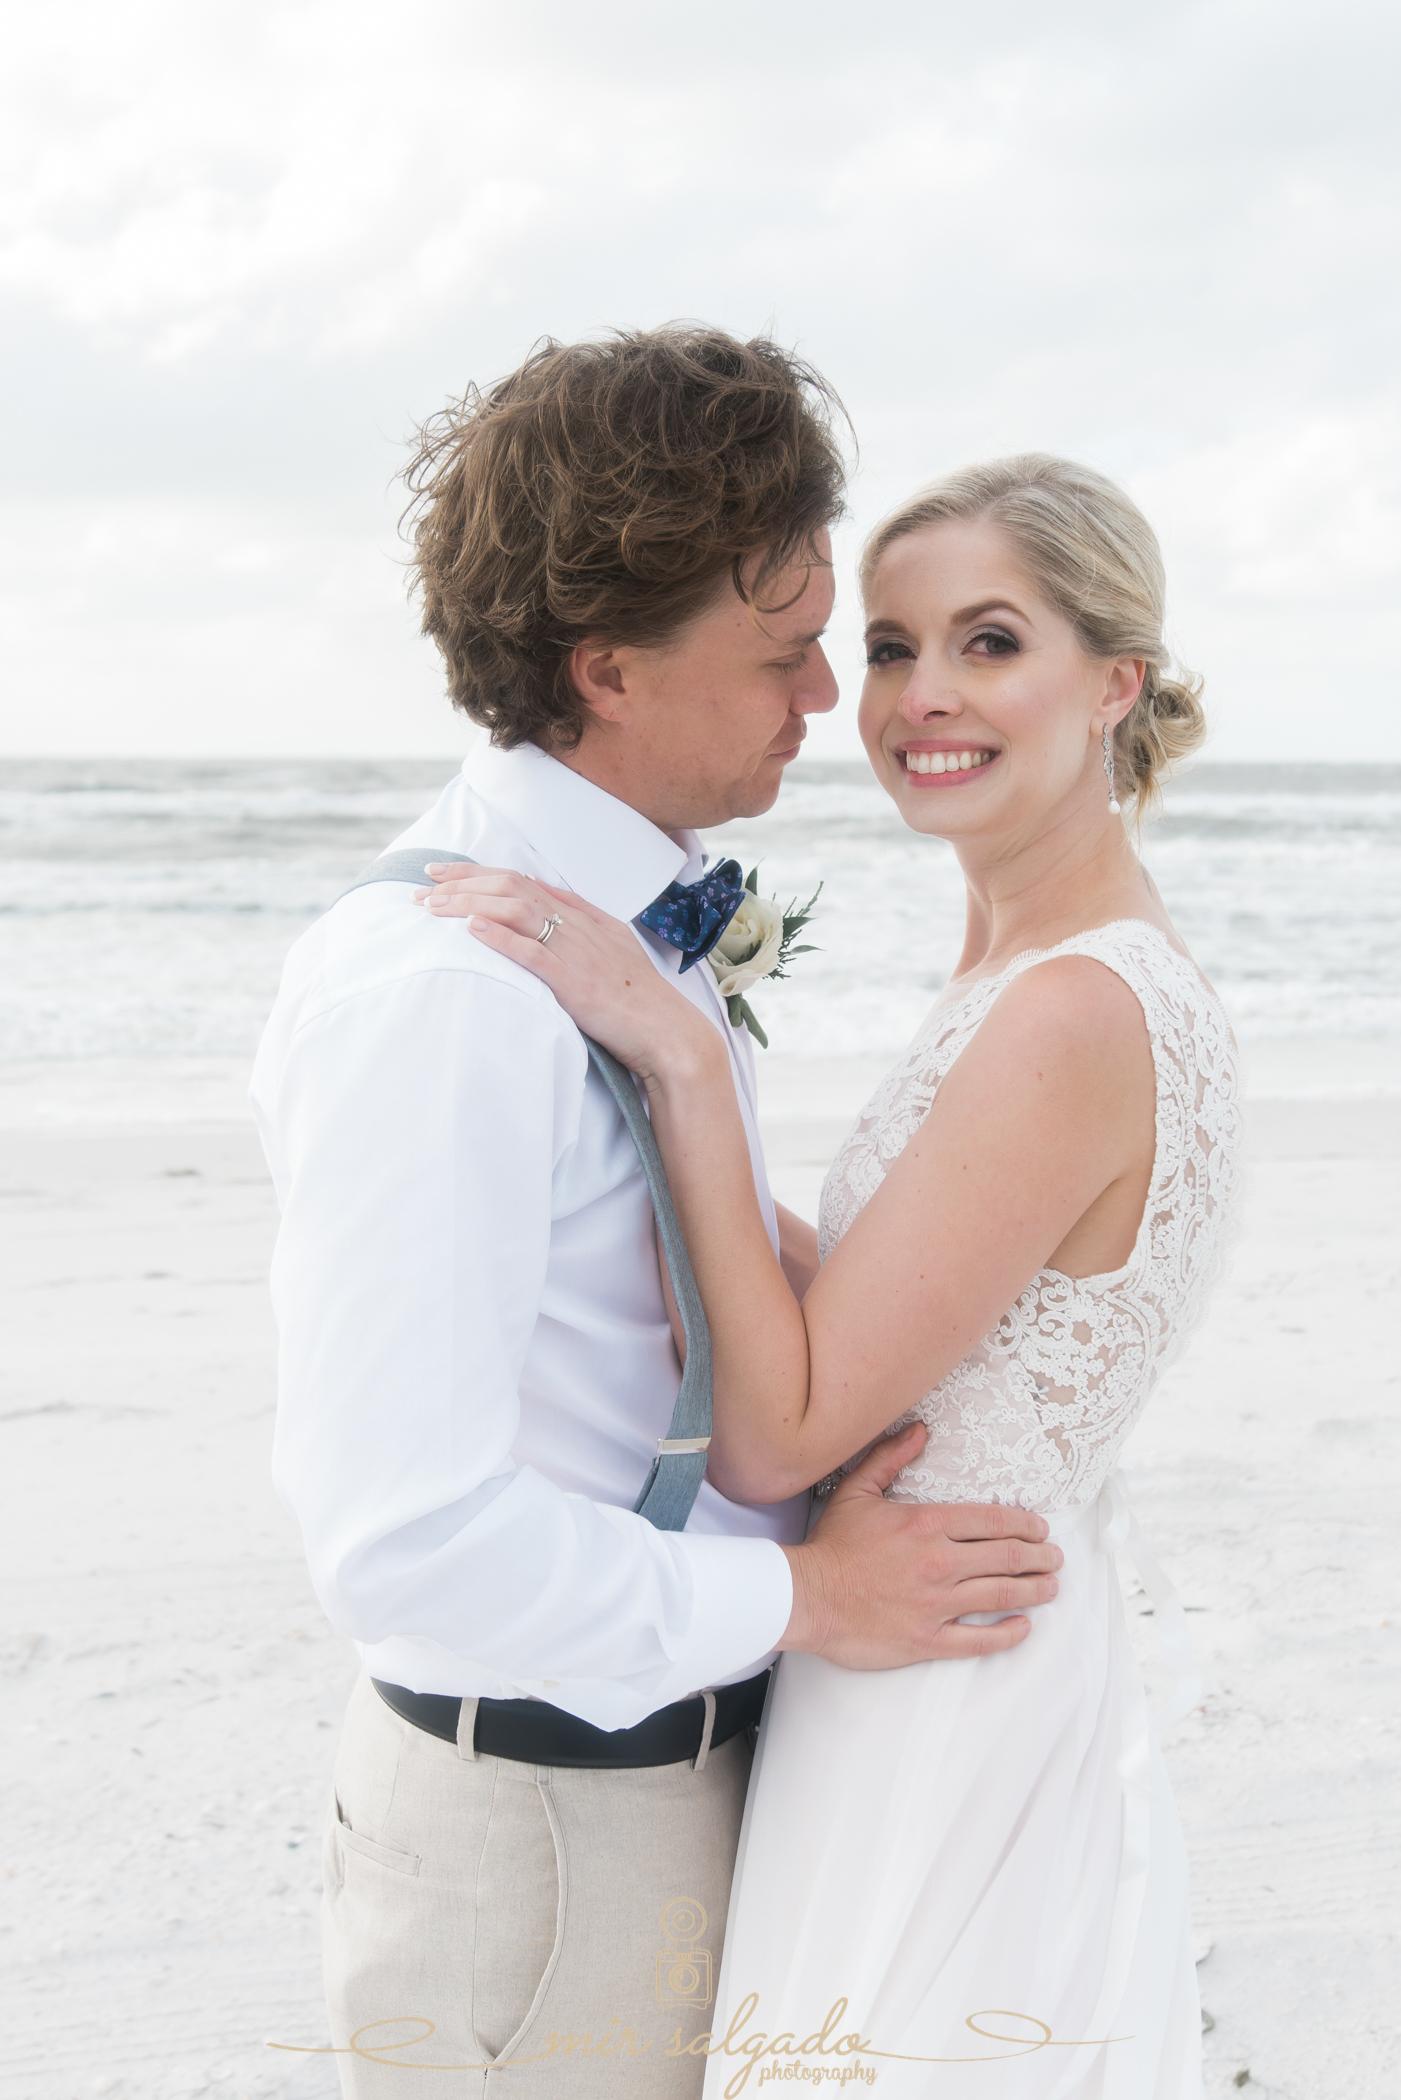 St.Pete-beach-wedding-photographer, St.Pete-wedding-photo, Florida-beach-wedding